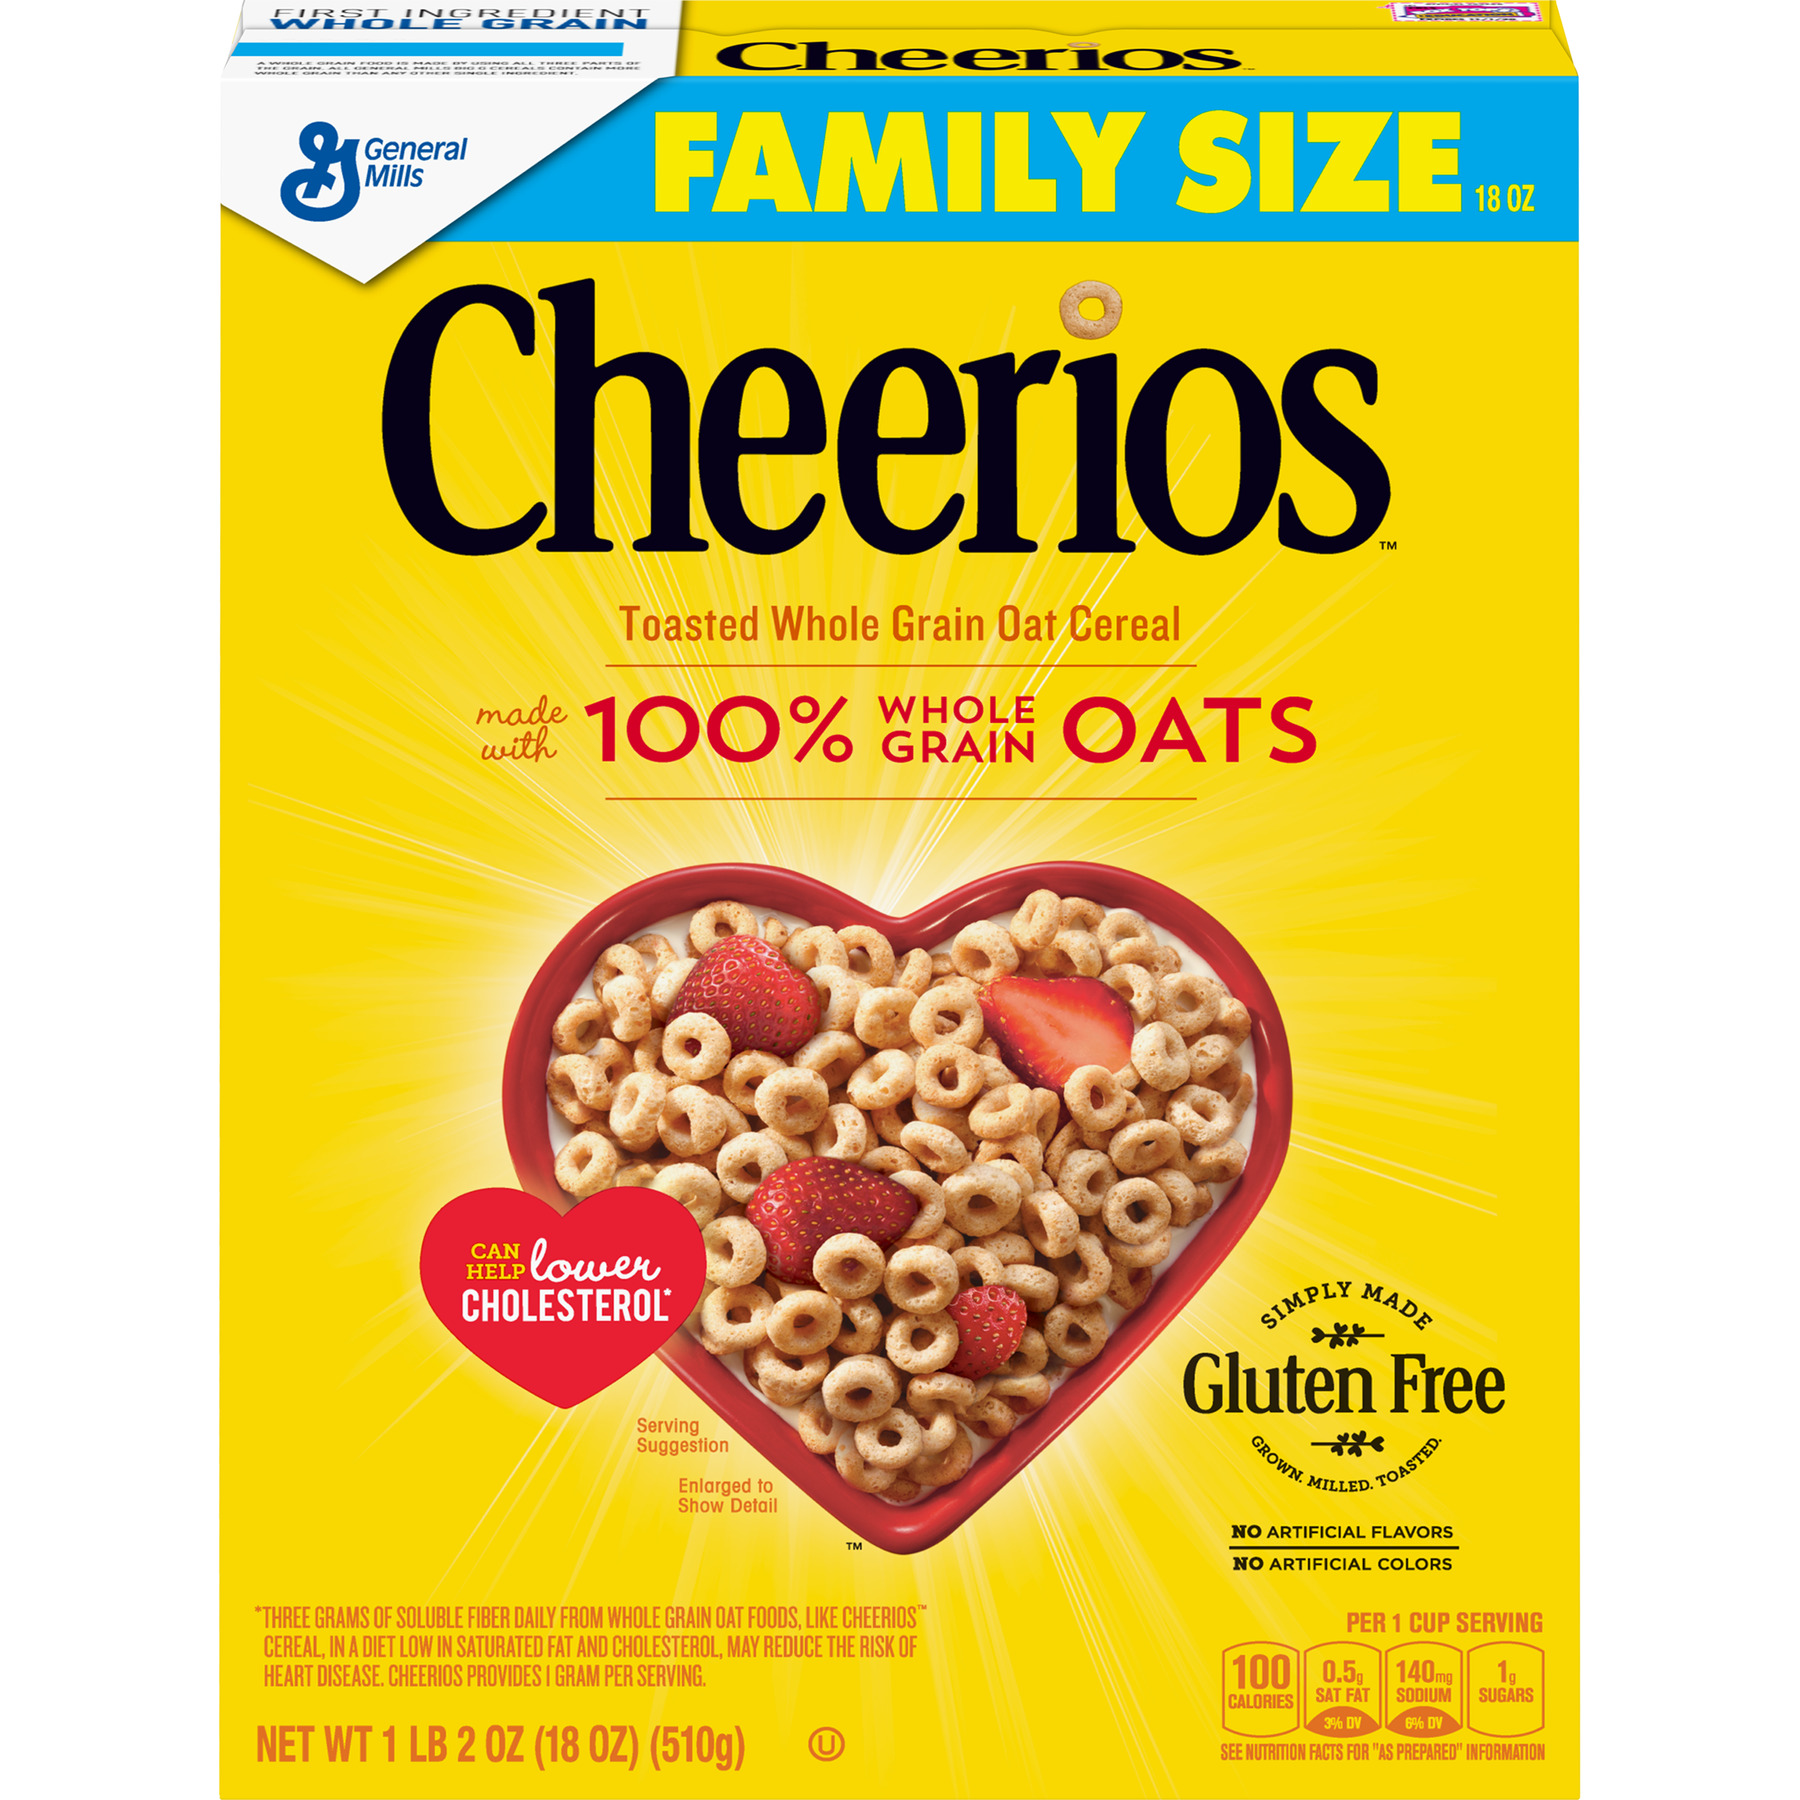 Cheerios, Gluten Free, Breakfast Cereal, Large Size, 18 oz Box